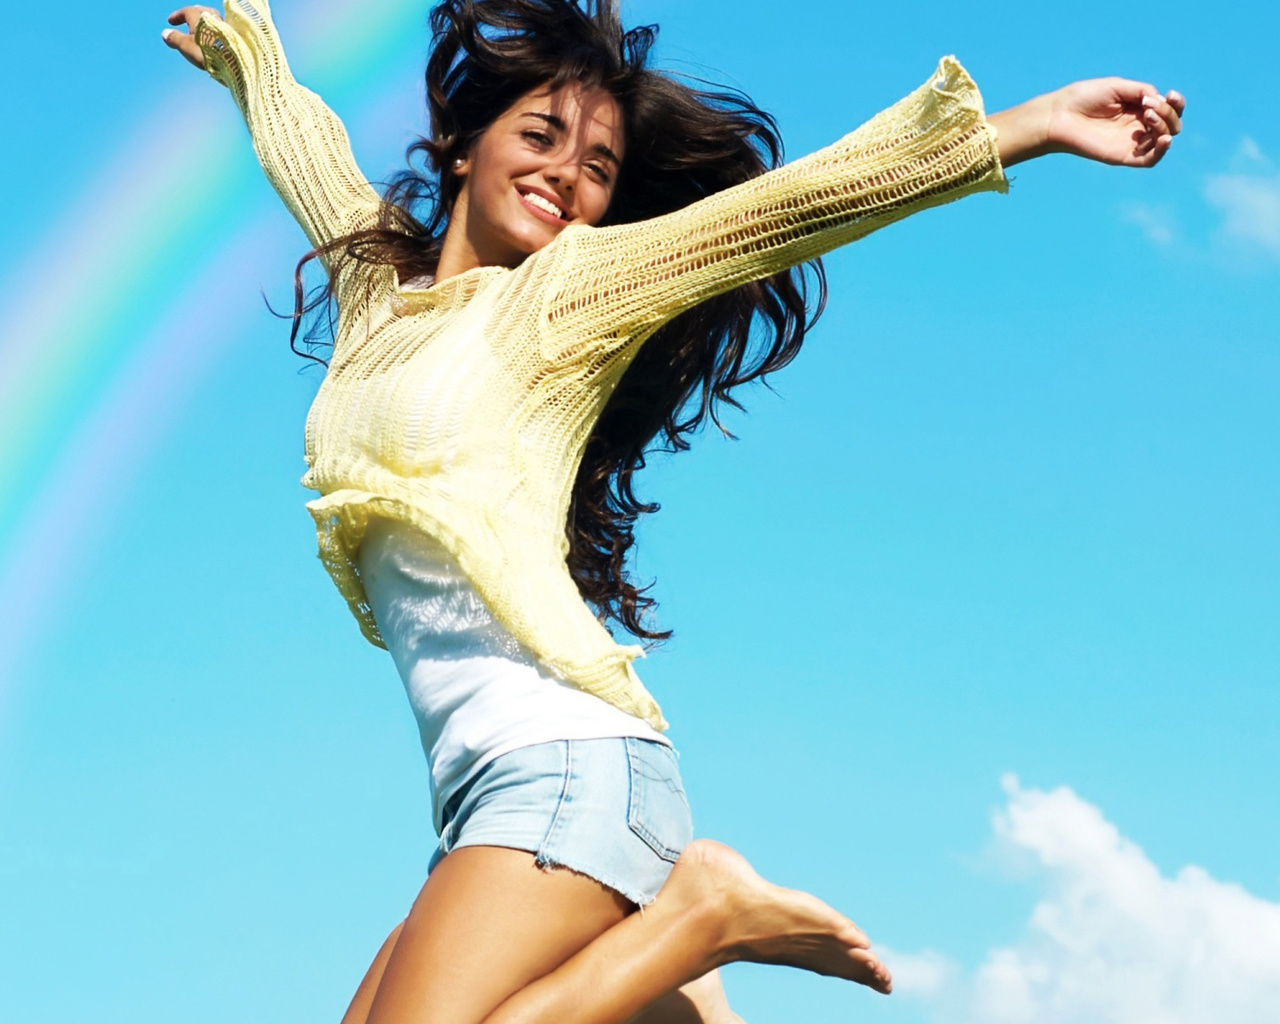 Фото девушка прыгает